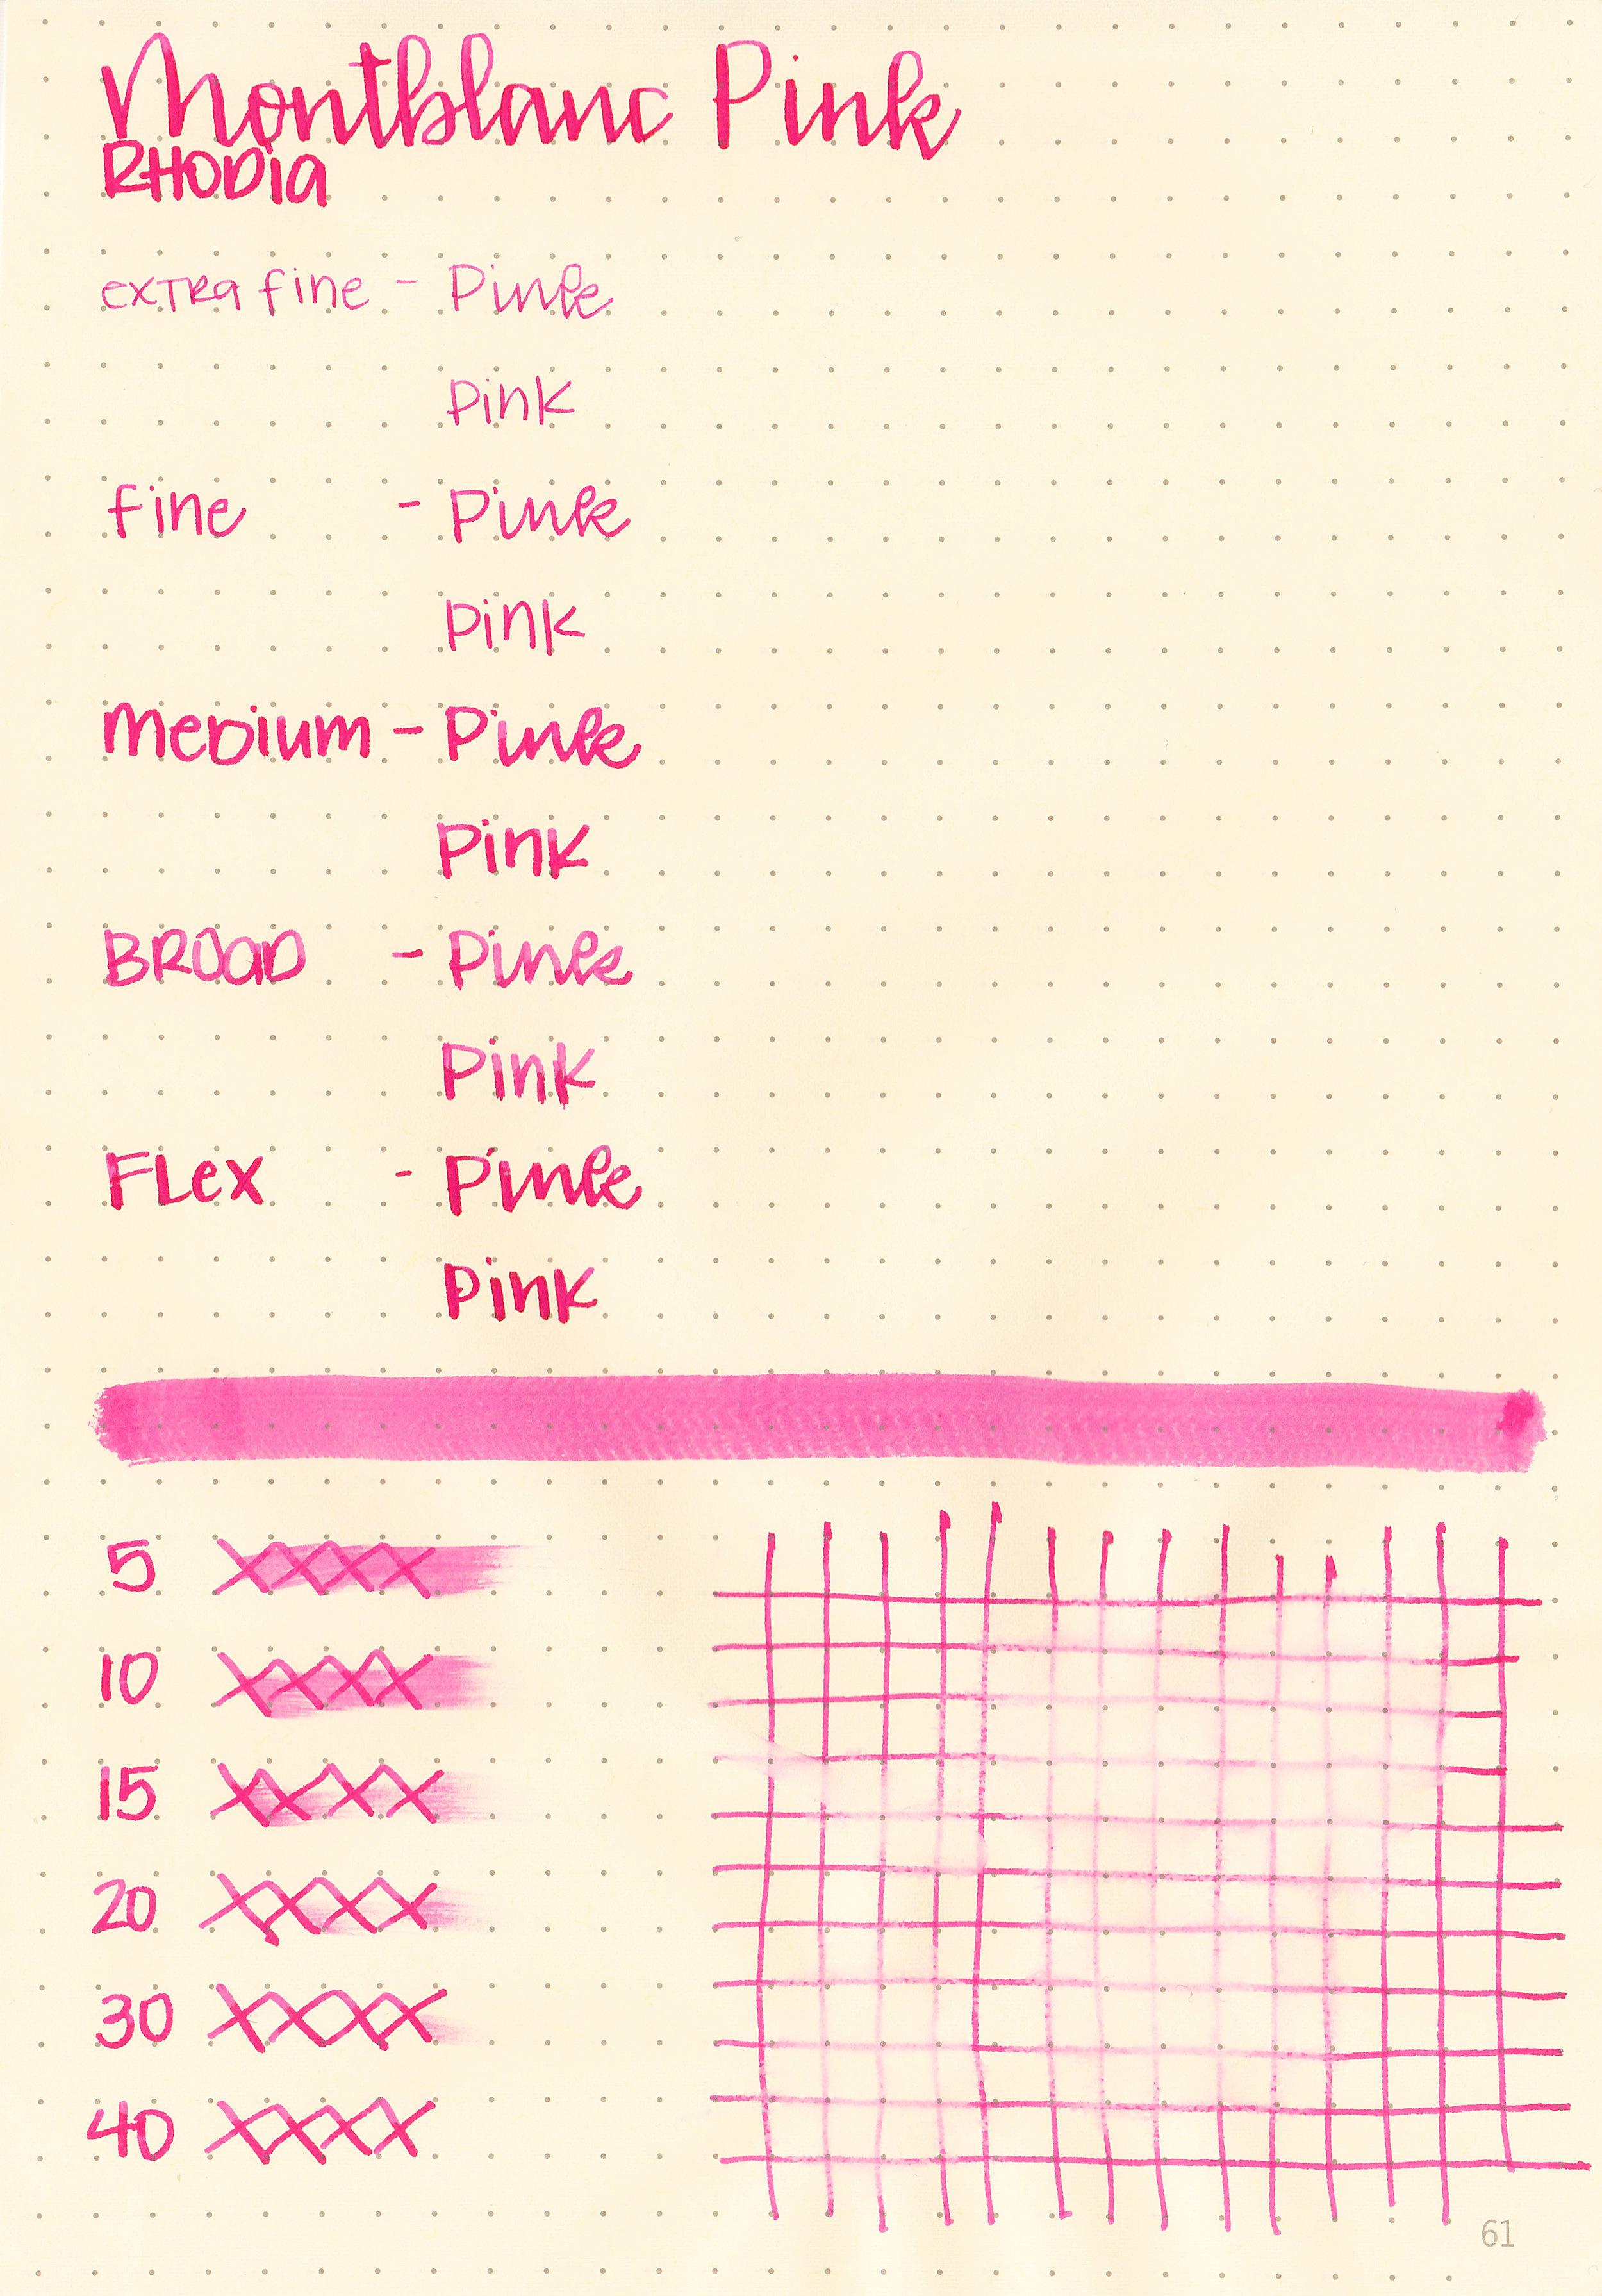 mb-pink-3.jpg